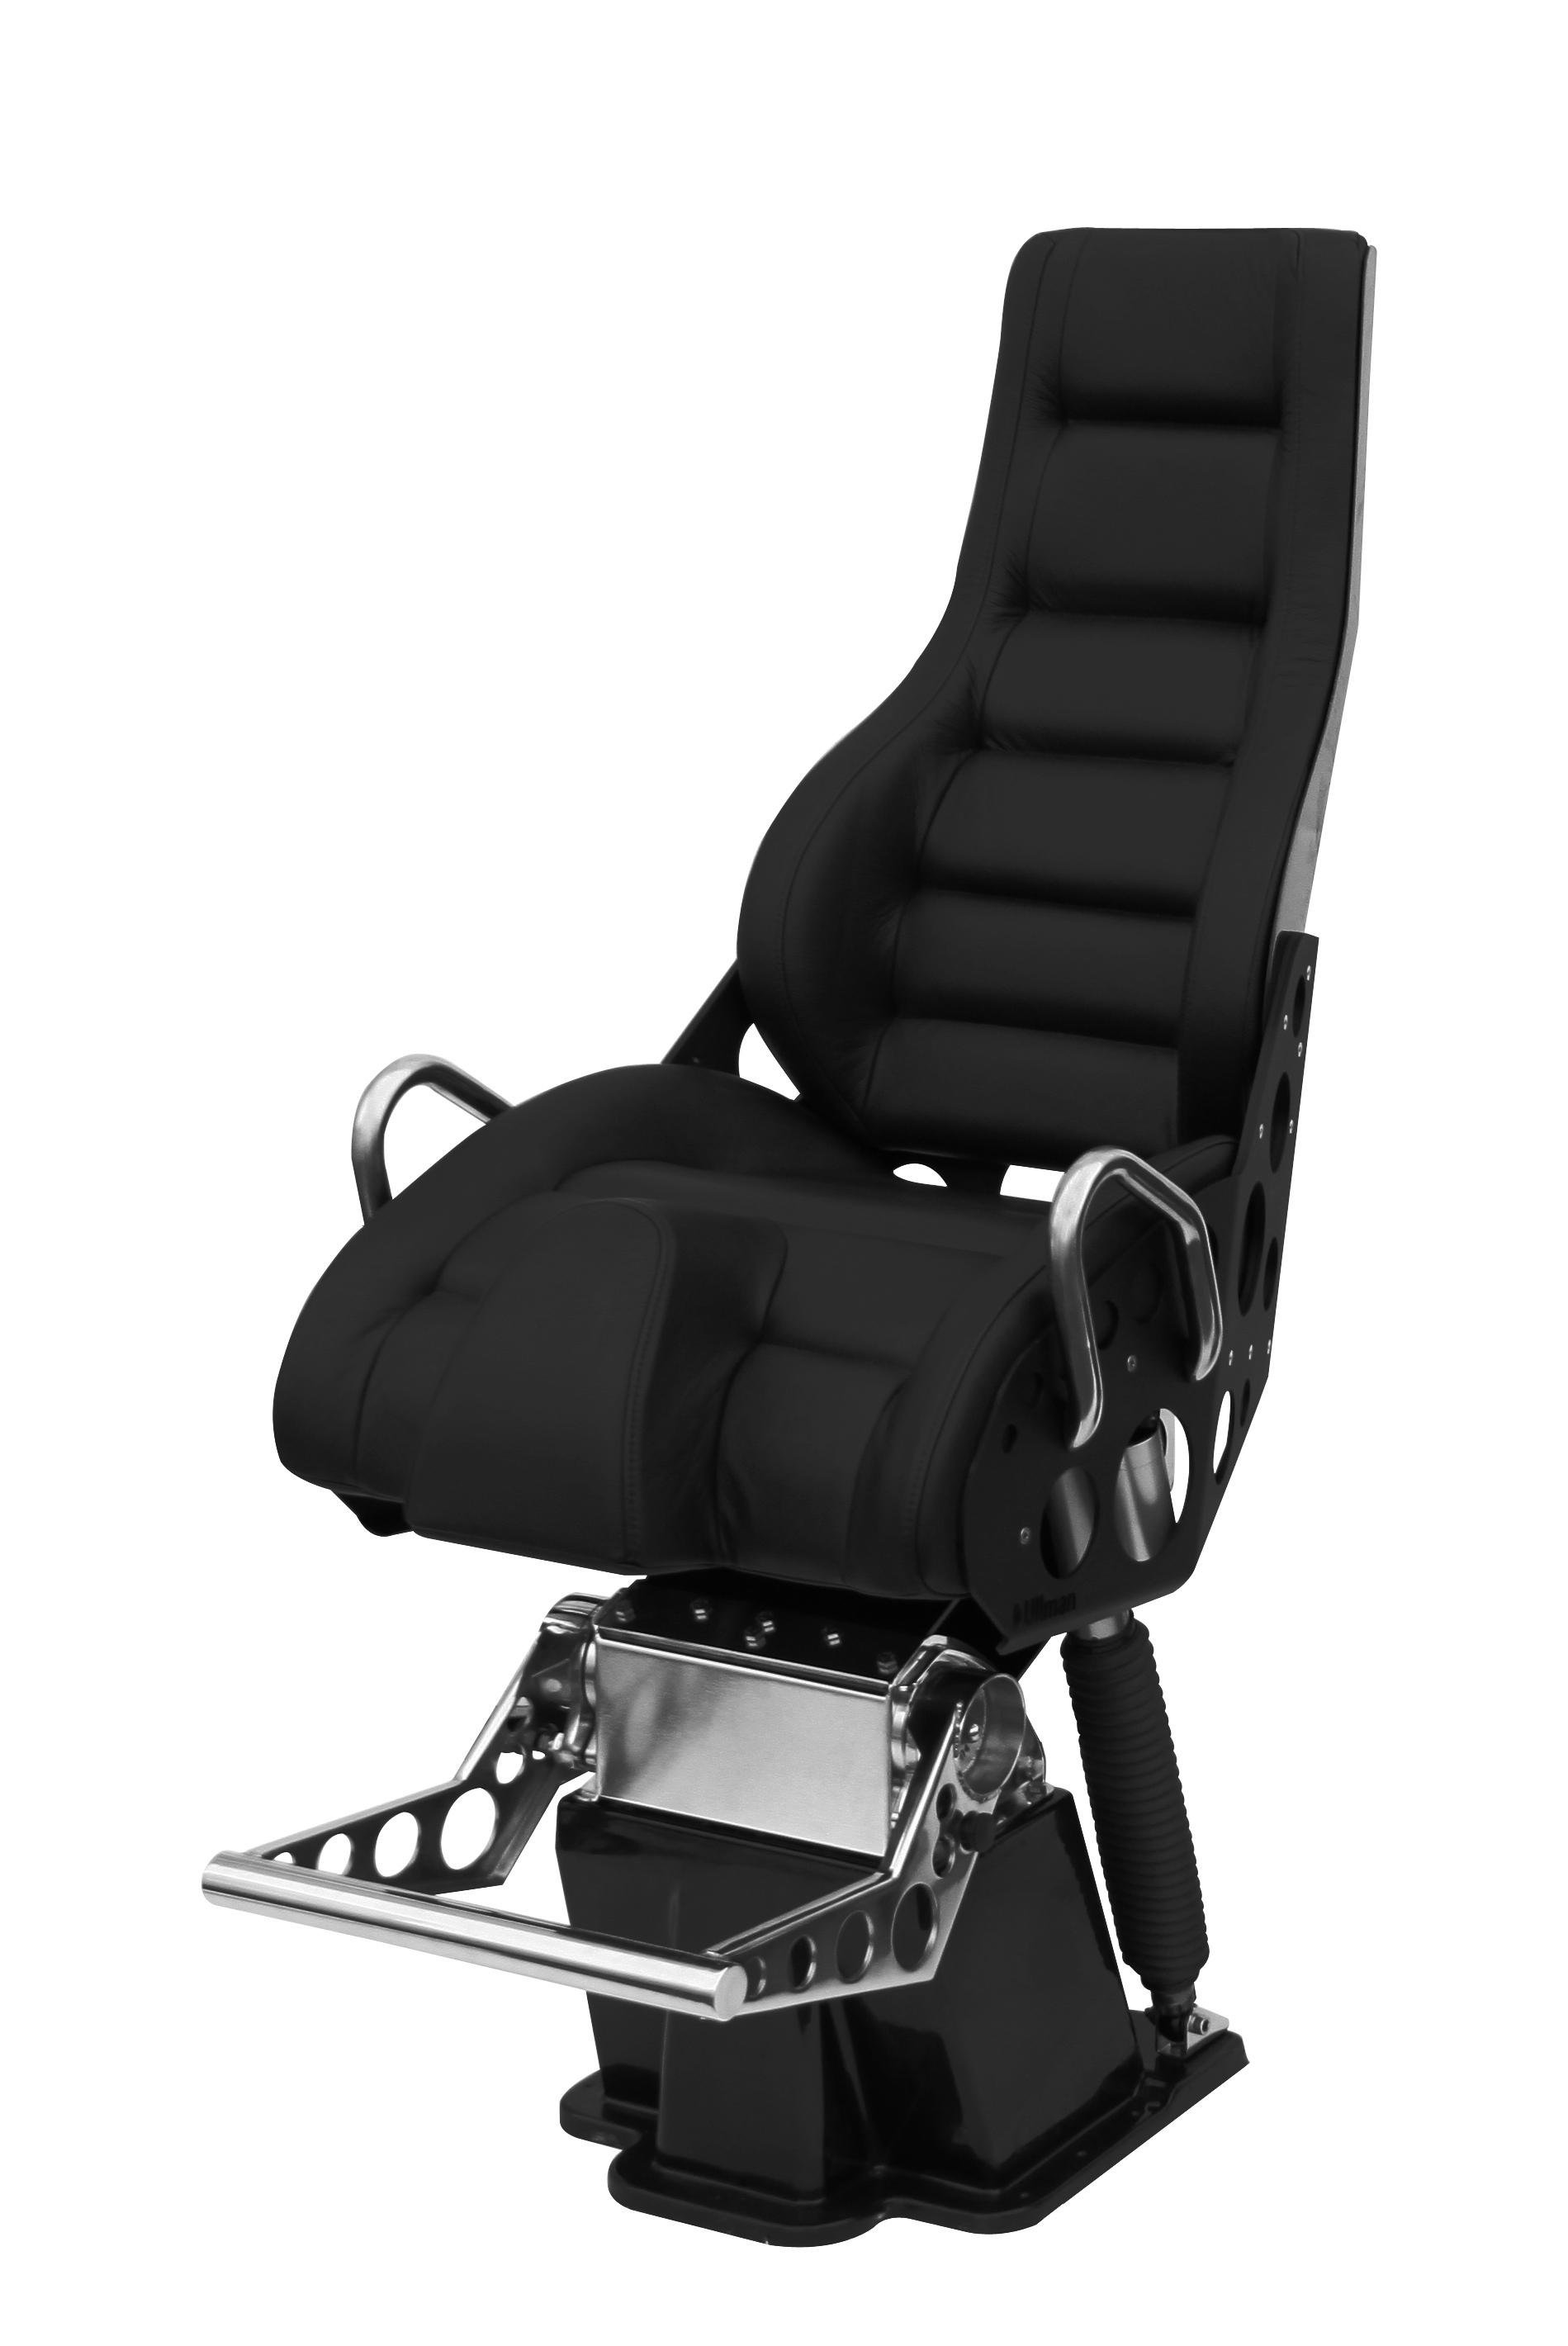 Atlantic | Ullman Dynamics - World Leader in Suspension Seats